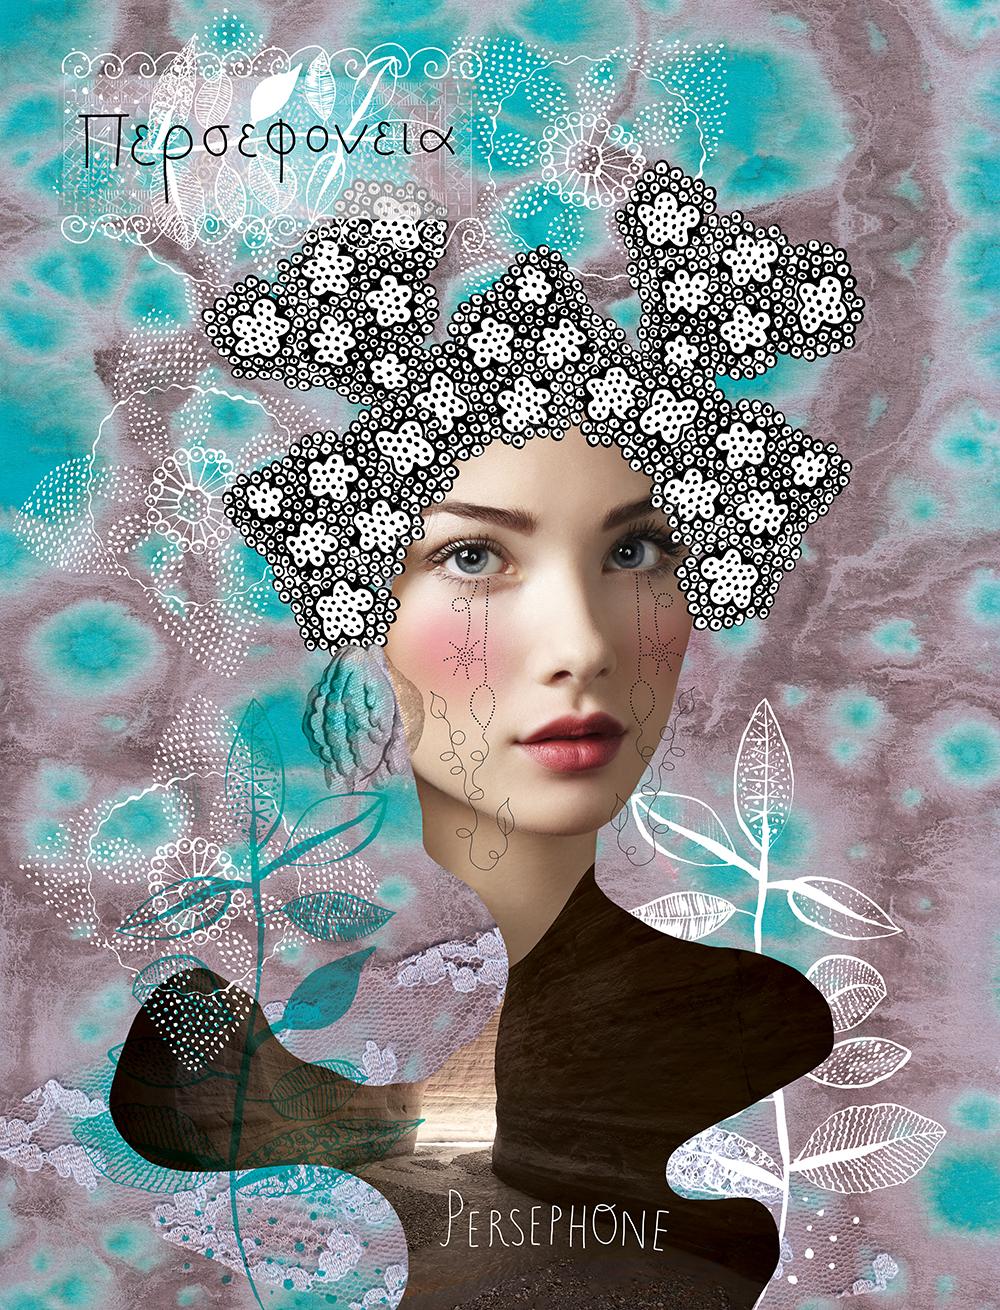 Persephone by marenthe.jpg